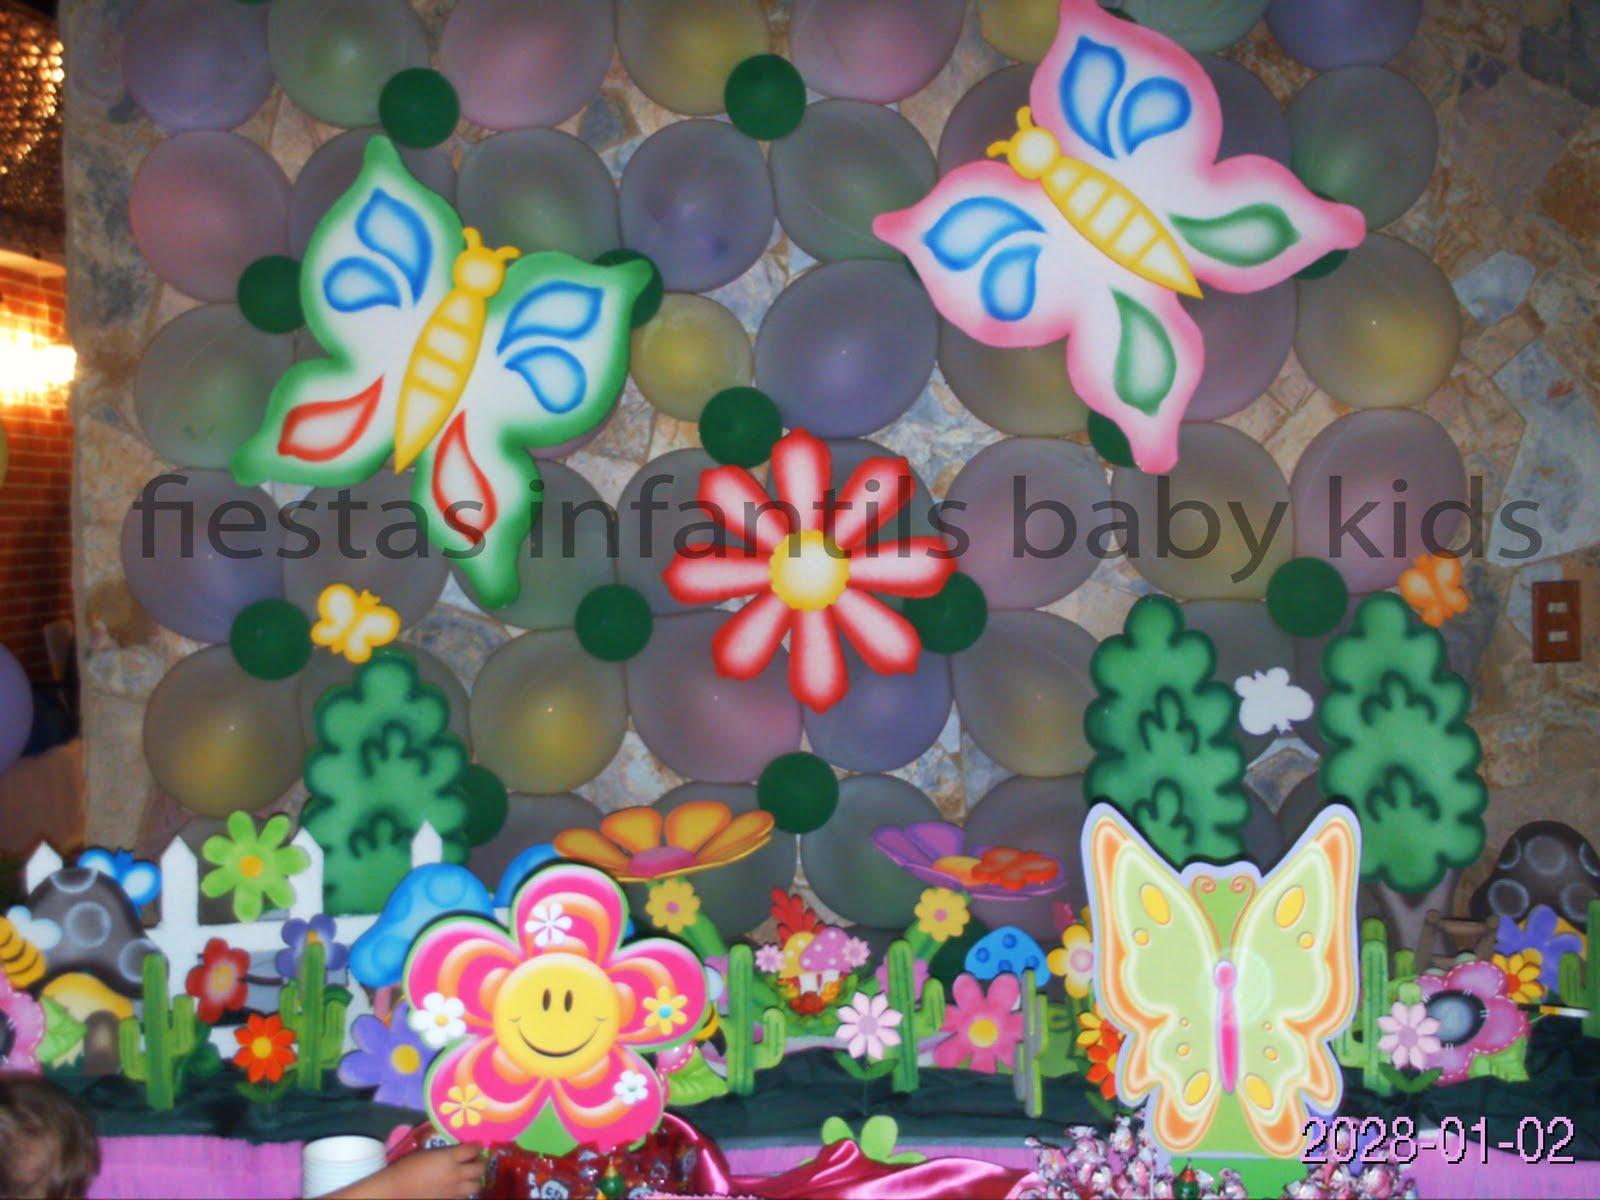 Fiestas infantiles baby kids decoracion de mariposa jardin for Decoracion de pared para fiestas infantiles